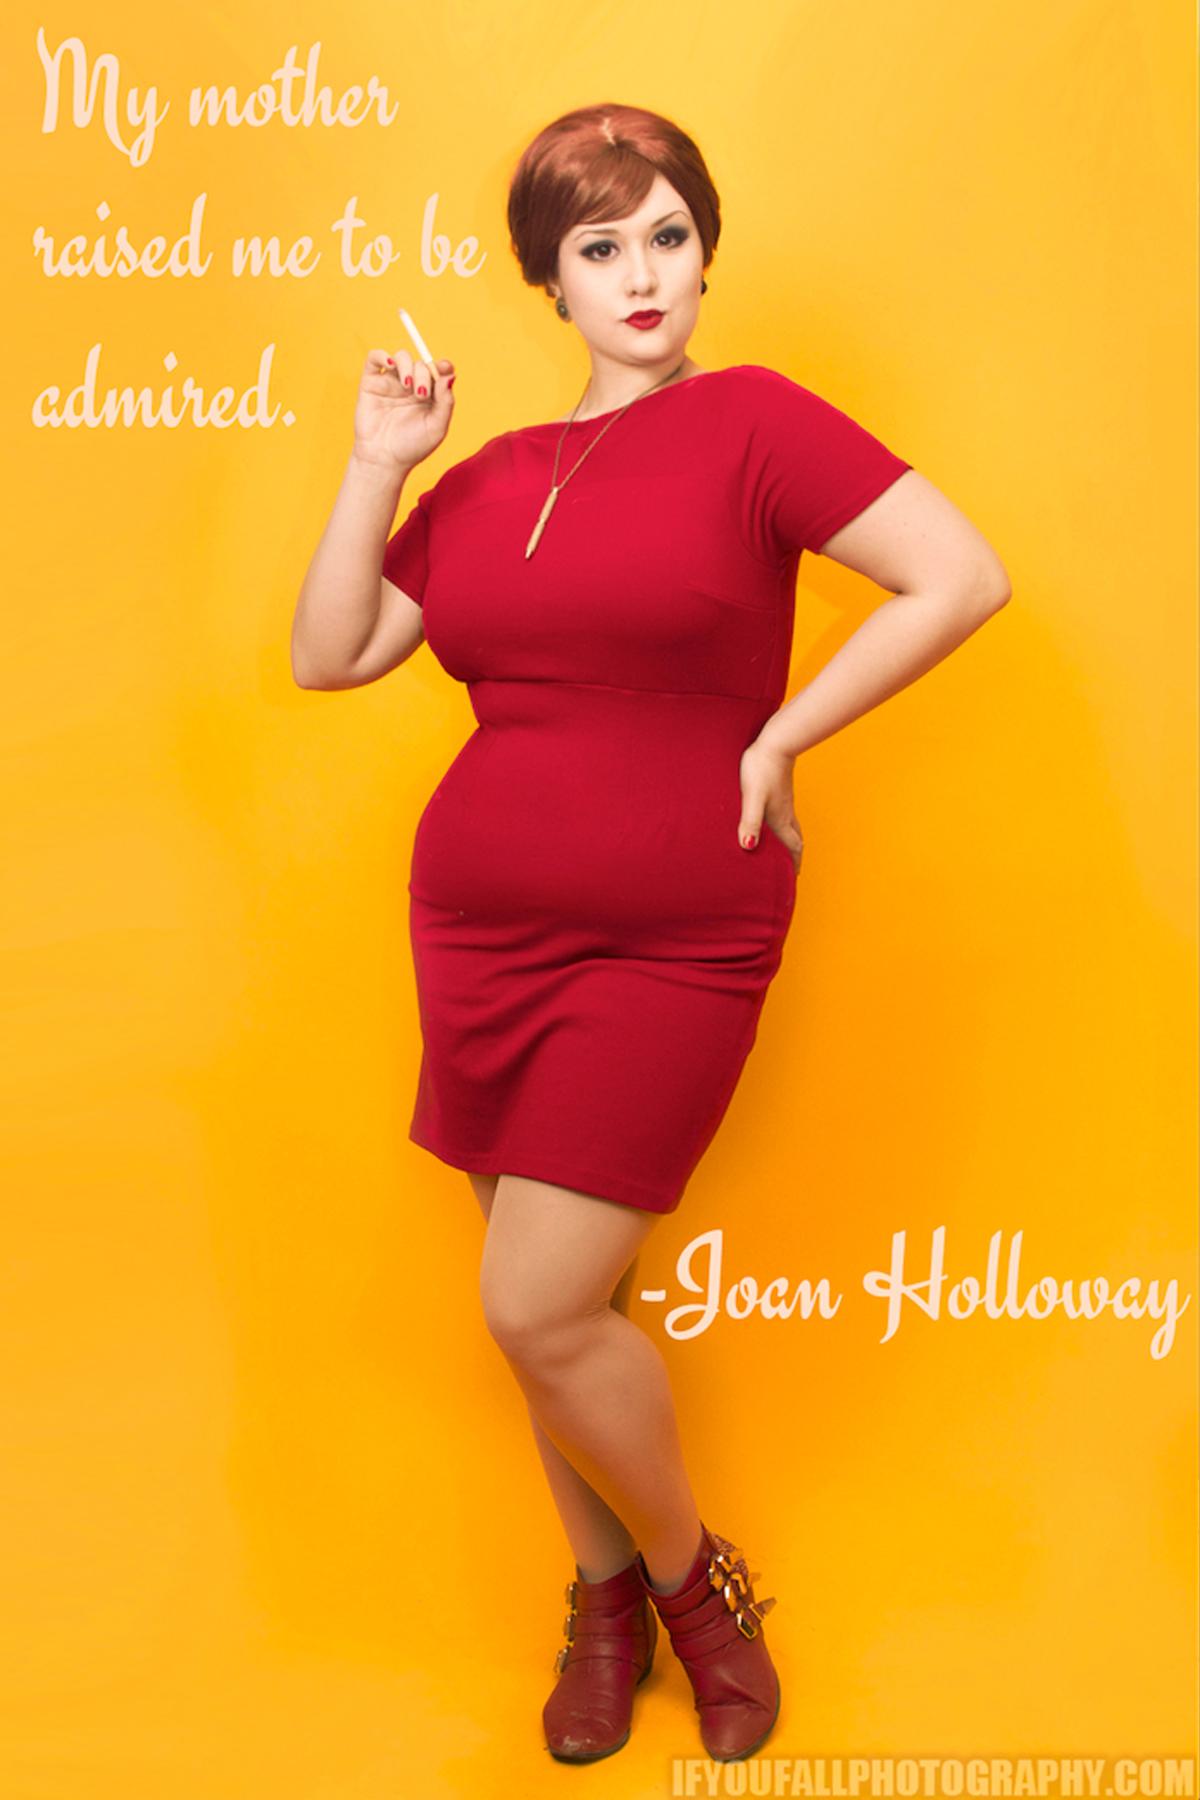 Joan Holloway Mad Men Cosplay Classically Curvy